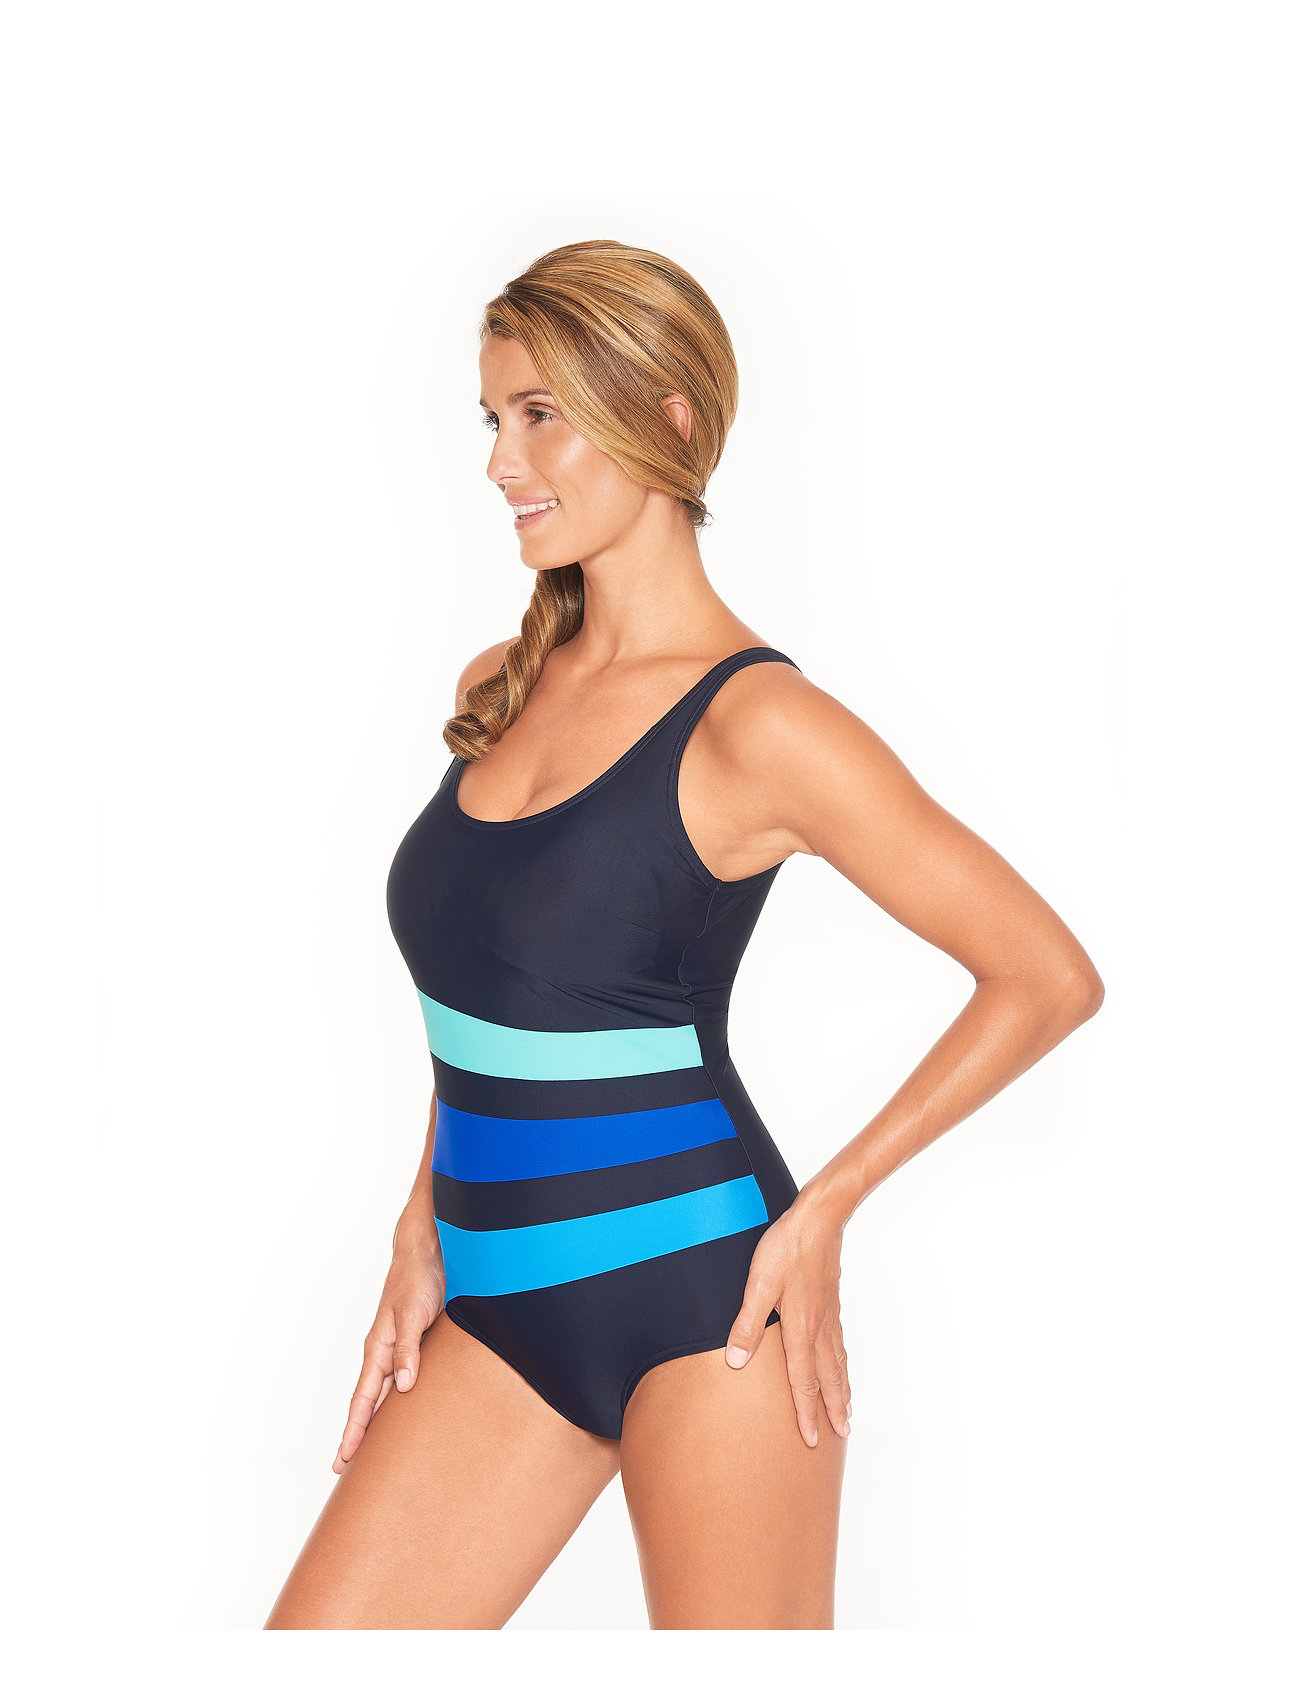 Swimsuit Bianca Swimsuit Bianca aquaWiki Classicnavy 3L5Aj4R